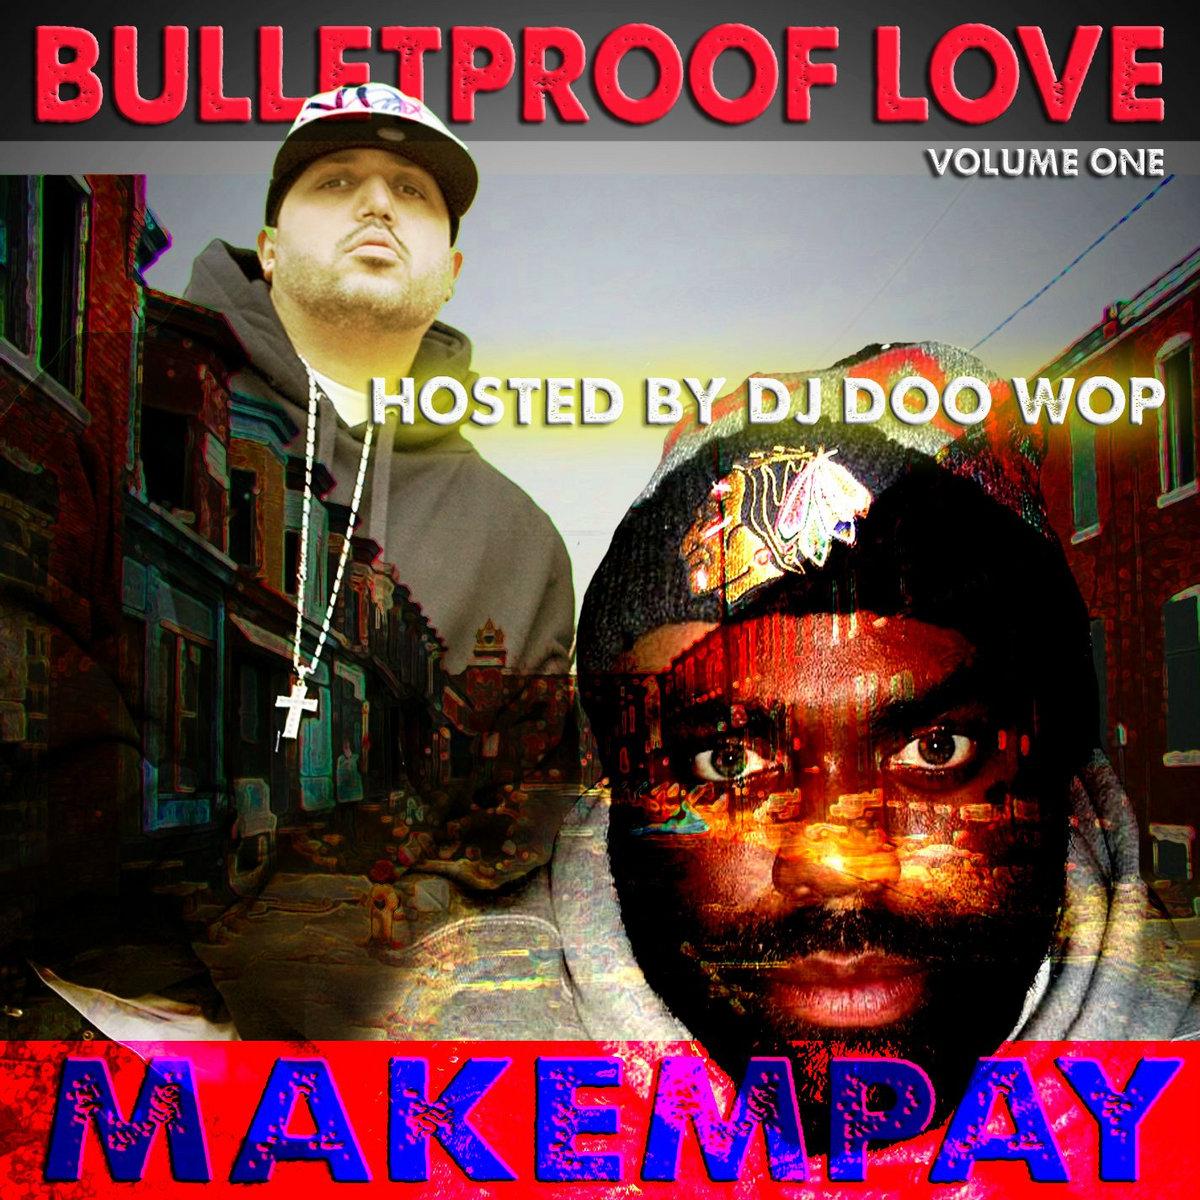 dj doo wop free mp3 download